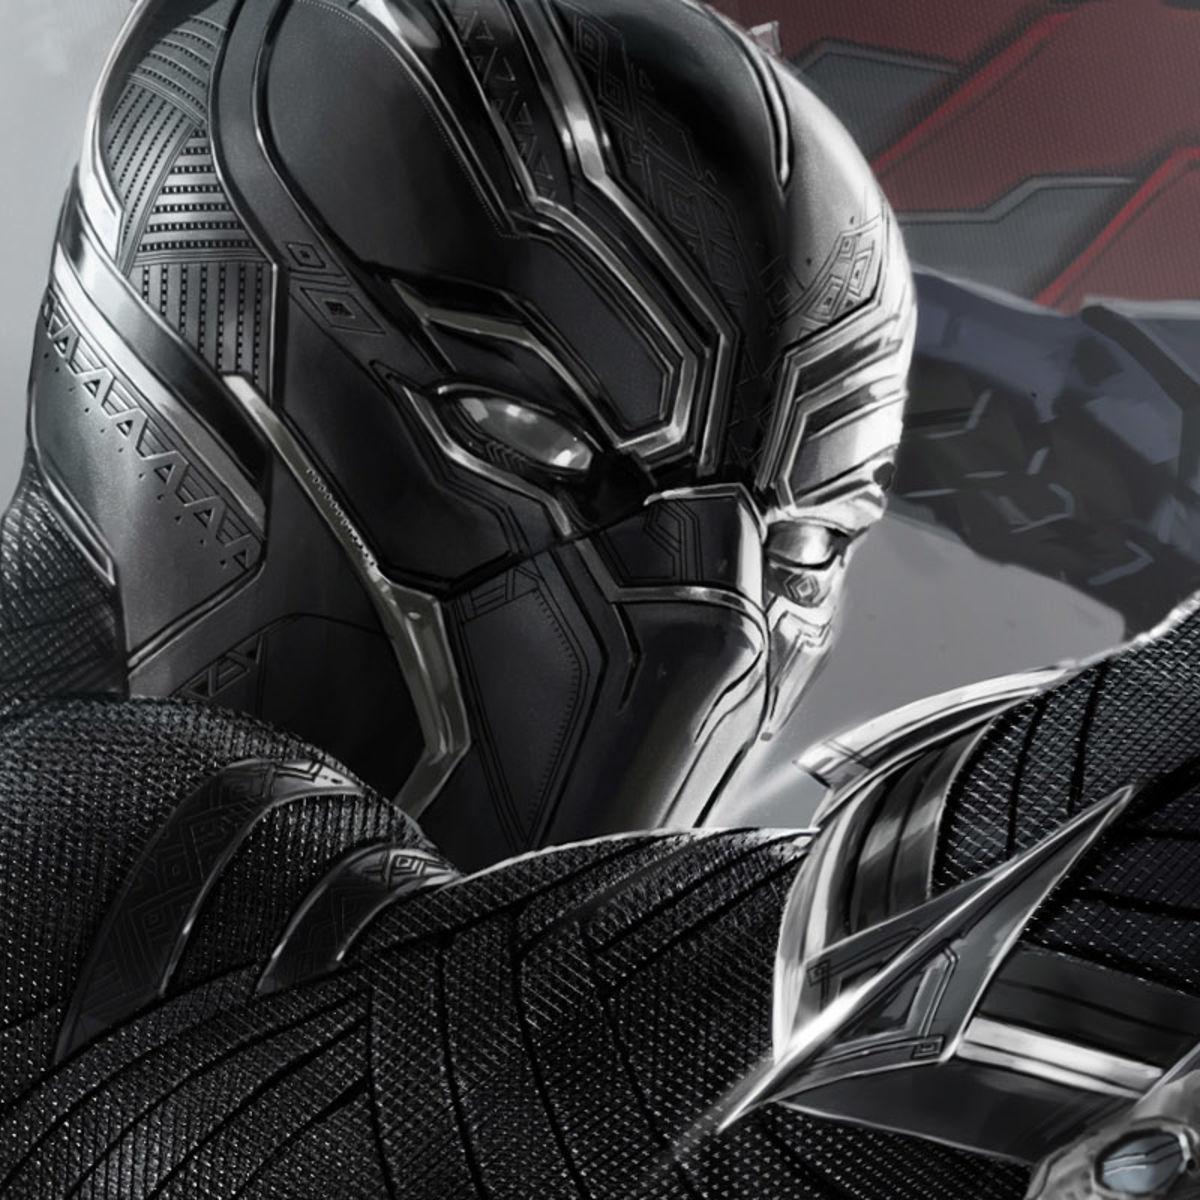 Black-Panther-Captain-America-Civil-War-concept-art_0.jpg